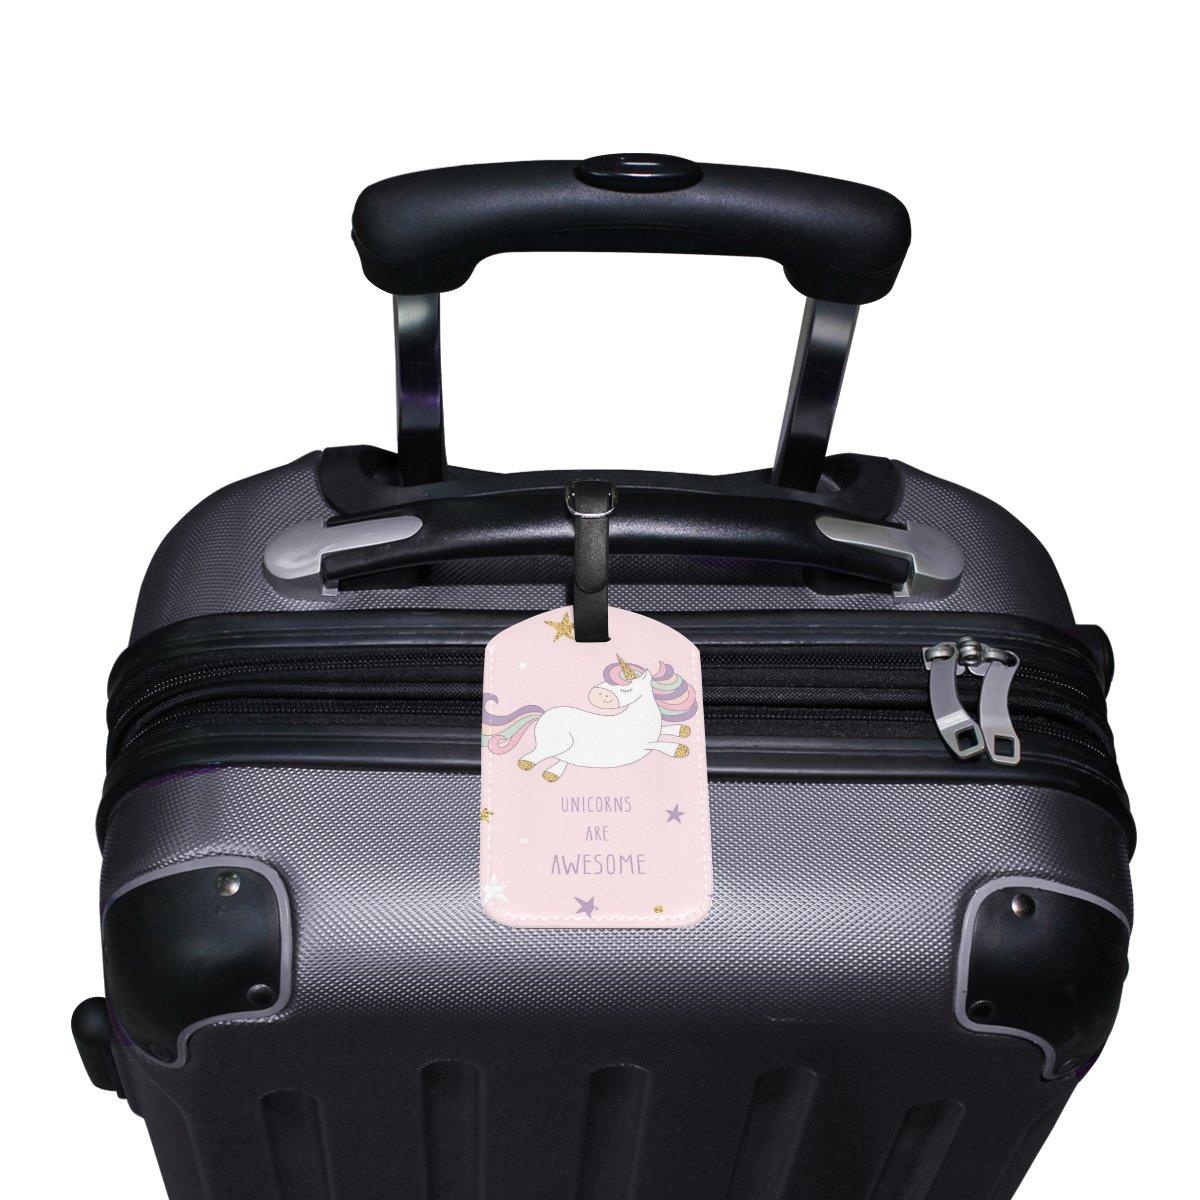 Saobao Travel Luggage Tag Night Sky PU Leather Baggage Travel ID